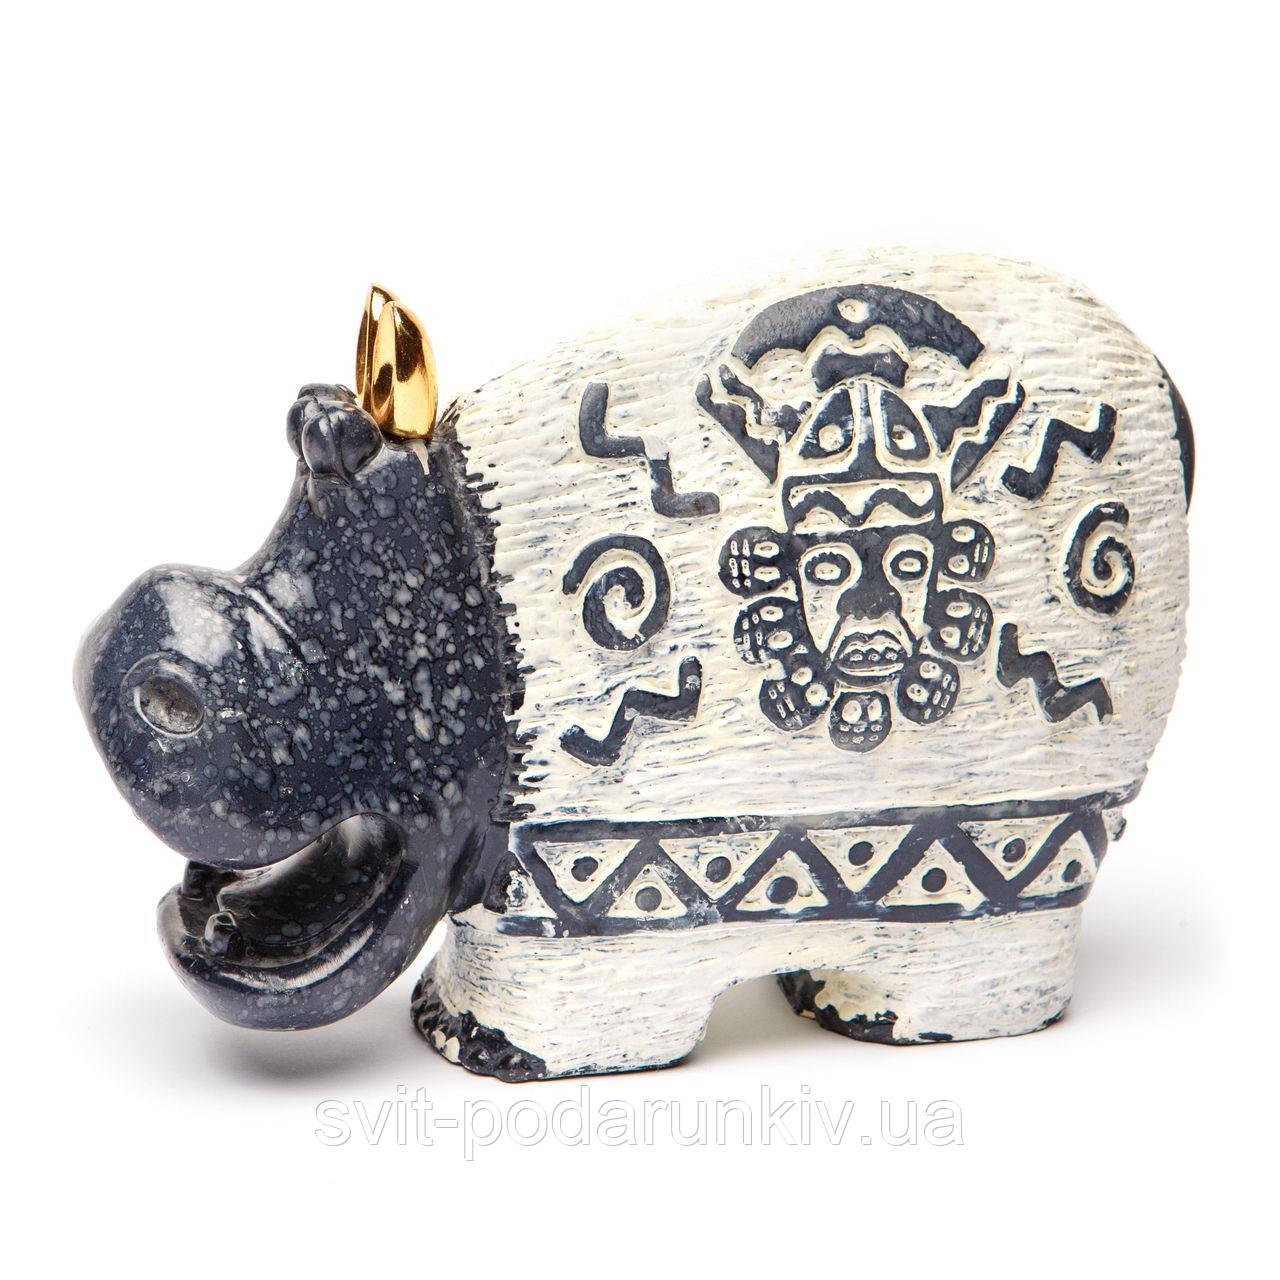 Статуэтка бегемота фигурка с декором (37503,37504,37505,37506) B